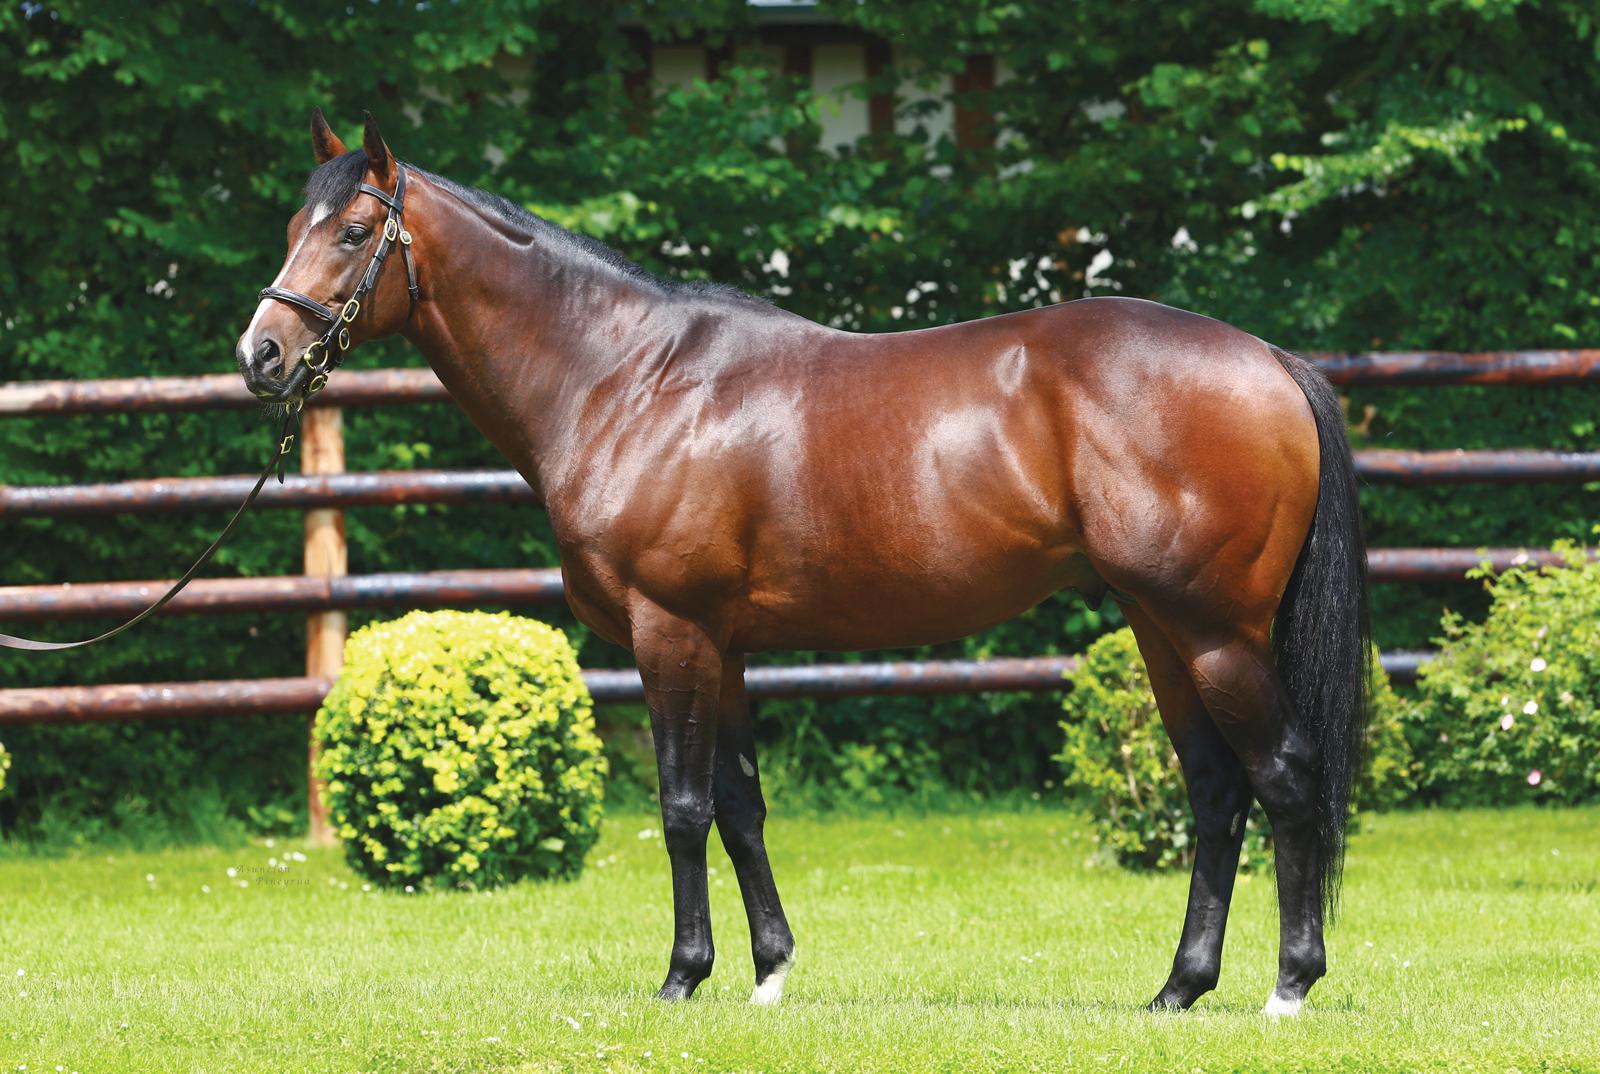 https://www.stallions.com.au/wp-content/uploads/2019/09/Shalaa-conformation_2018-web.jpg